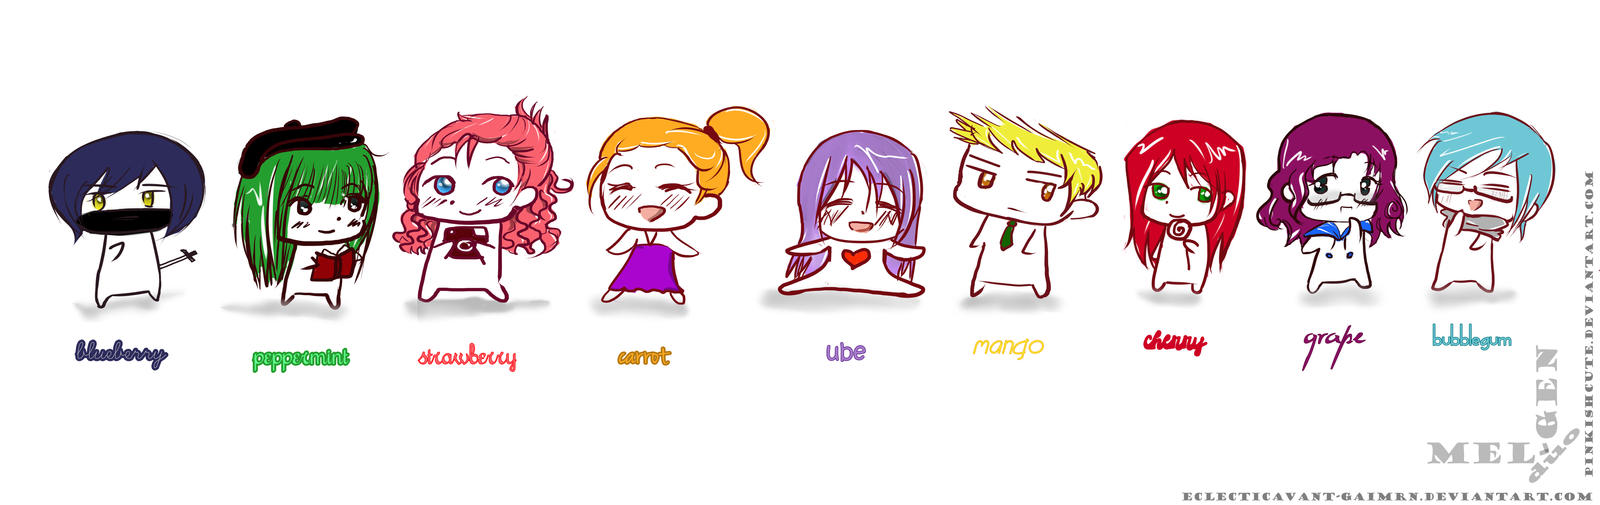 Chibi friends: Flavors by Pinkishcute on DeviantArt